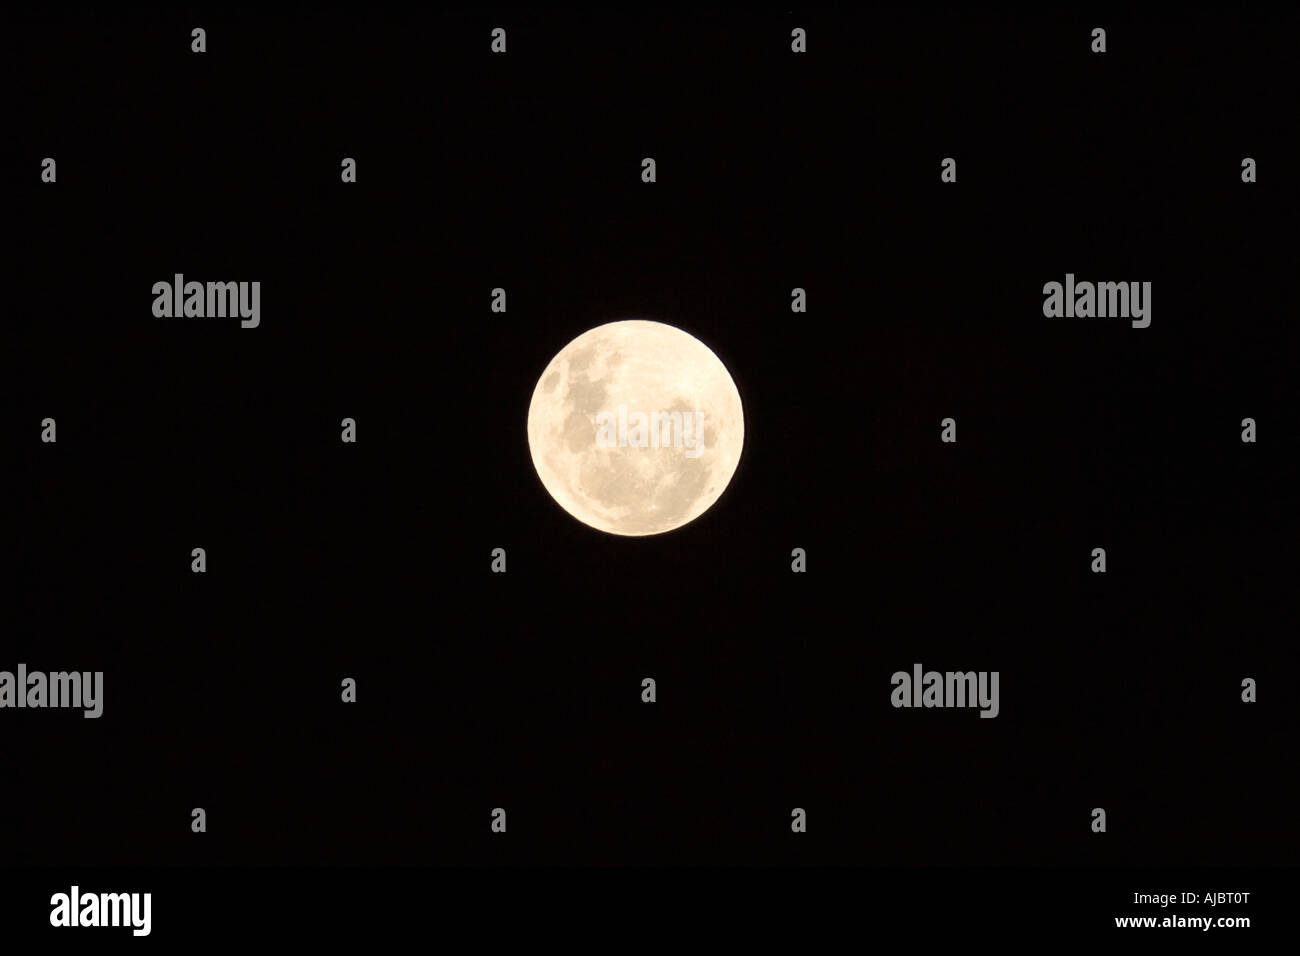 Full Moon in a Black Sky - Stock Image